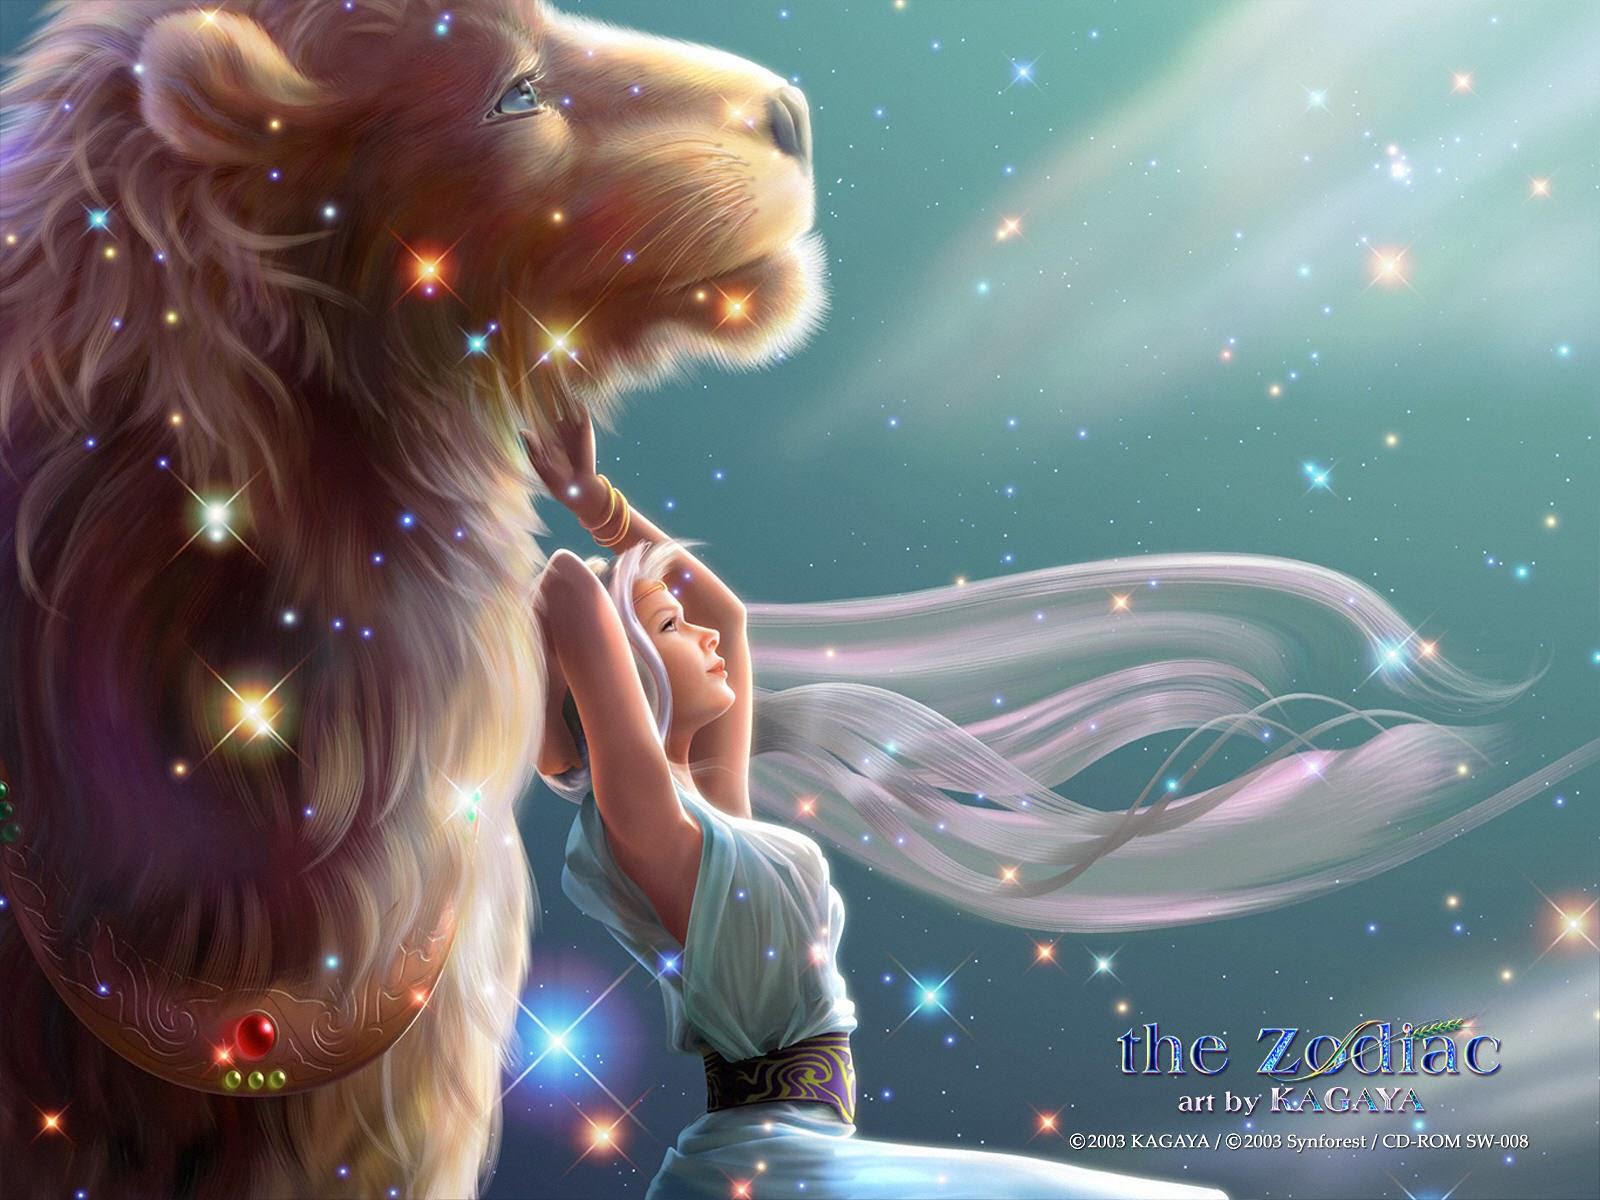 Ramalan bintang zodiak leo terbaru sifat dan karakter bintang ciri ciri dan kepribadian zodiak leo reheart Choice Image